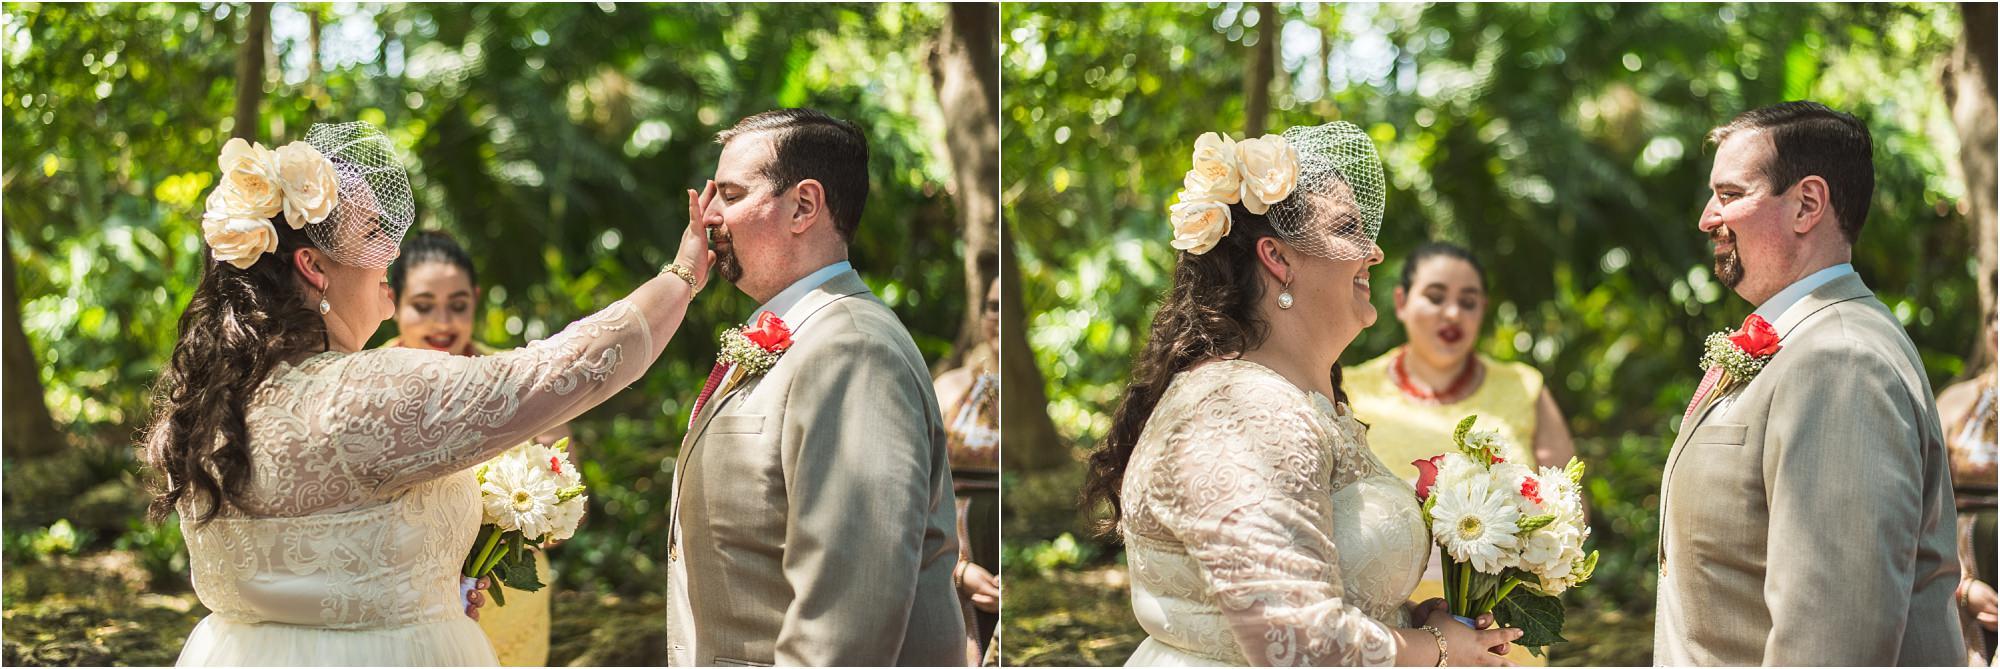 outdoor-rustic-pincrest-gardens-wedding-miami-photographer-jessenia-gonzalez_1032.jpg